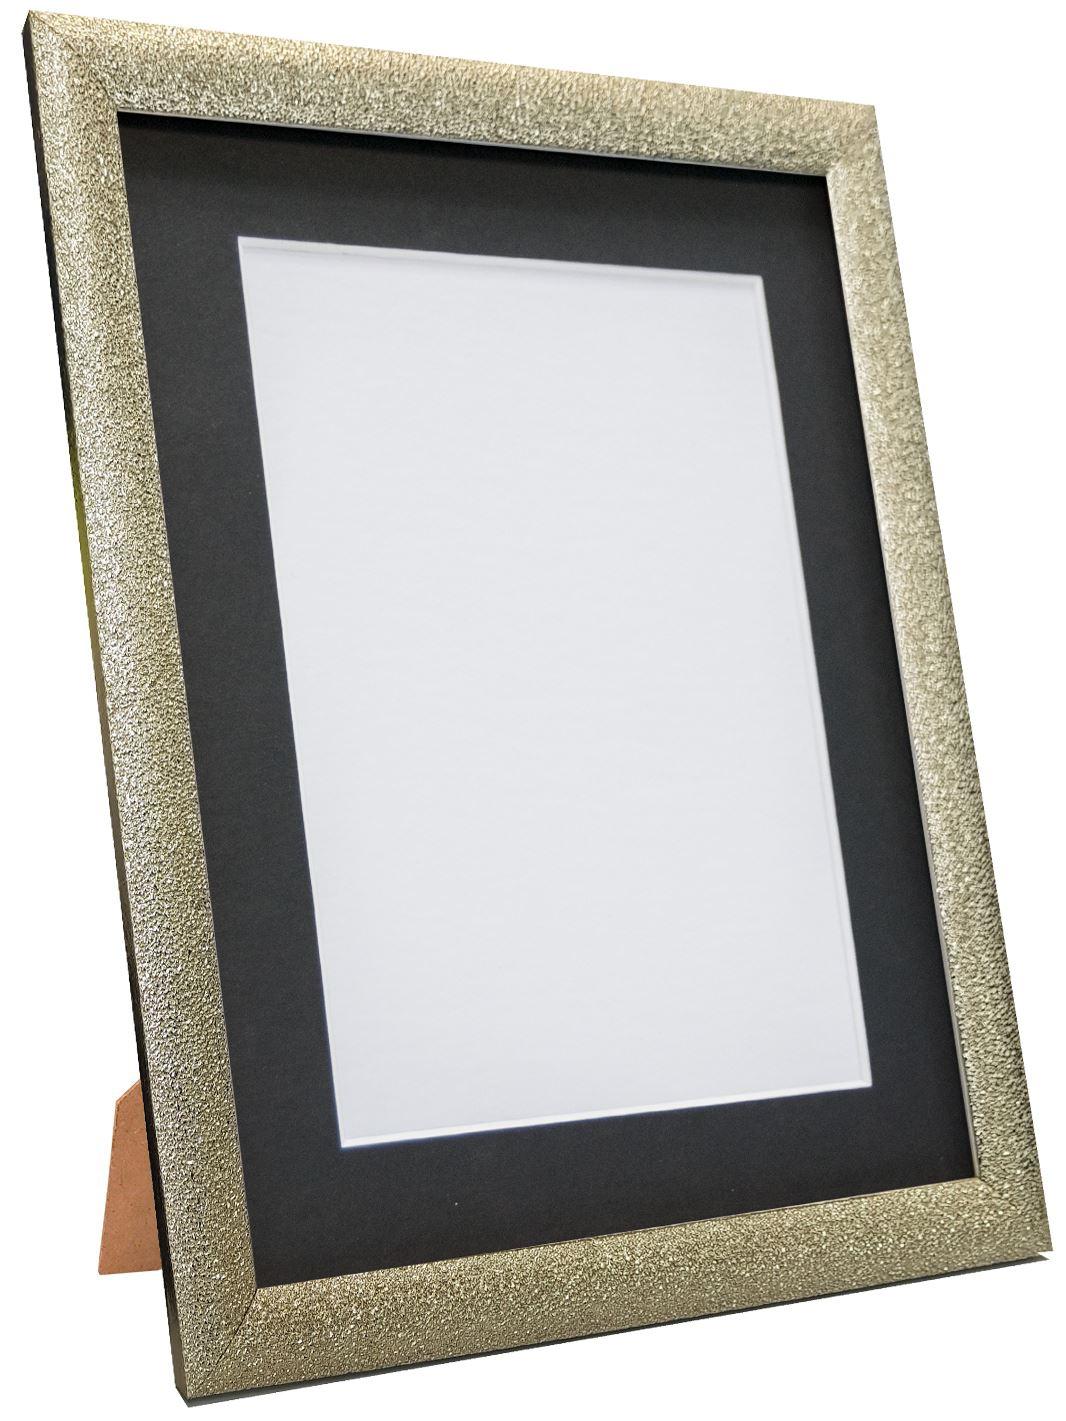 Glitz Champagne Silver Picture Photo Frame with White Black and Colour Mount